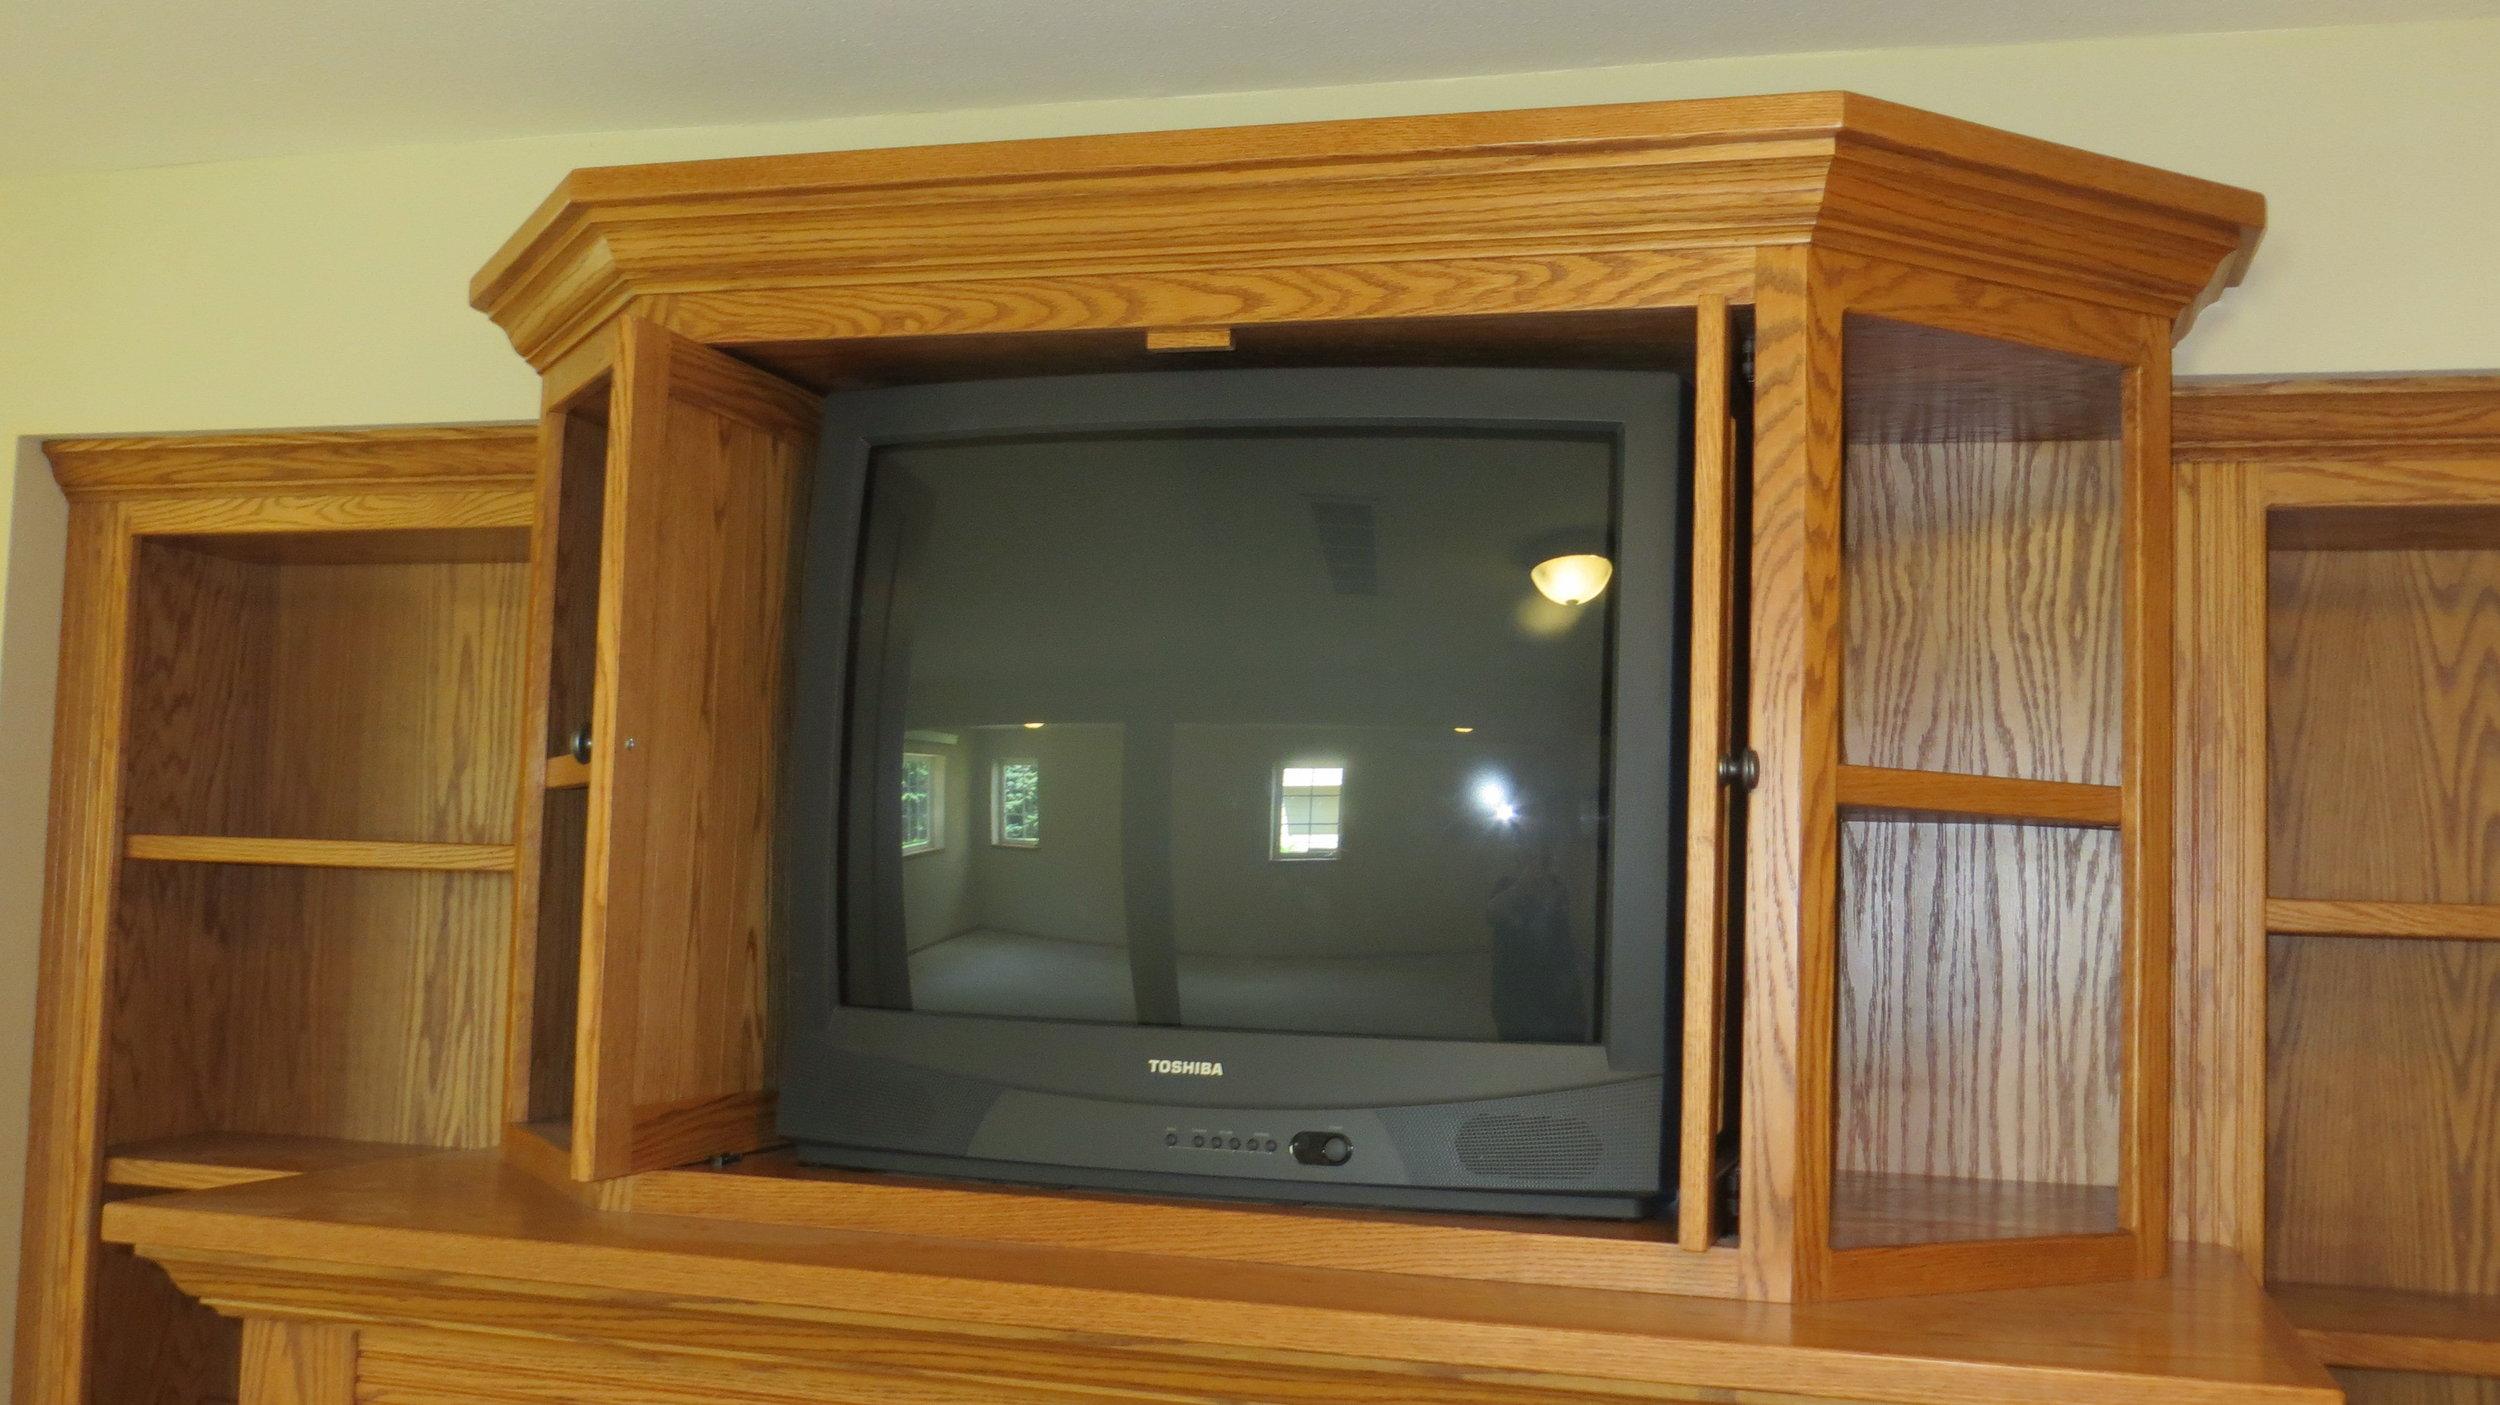 Flipper-doors-on-TV-cabinet.jpg